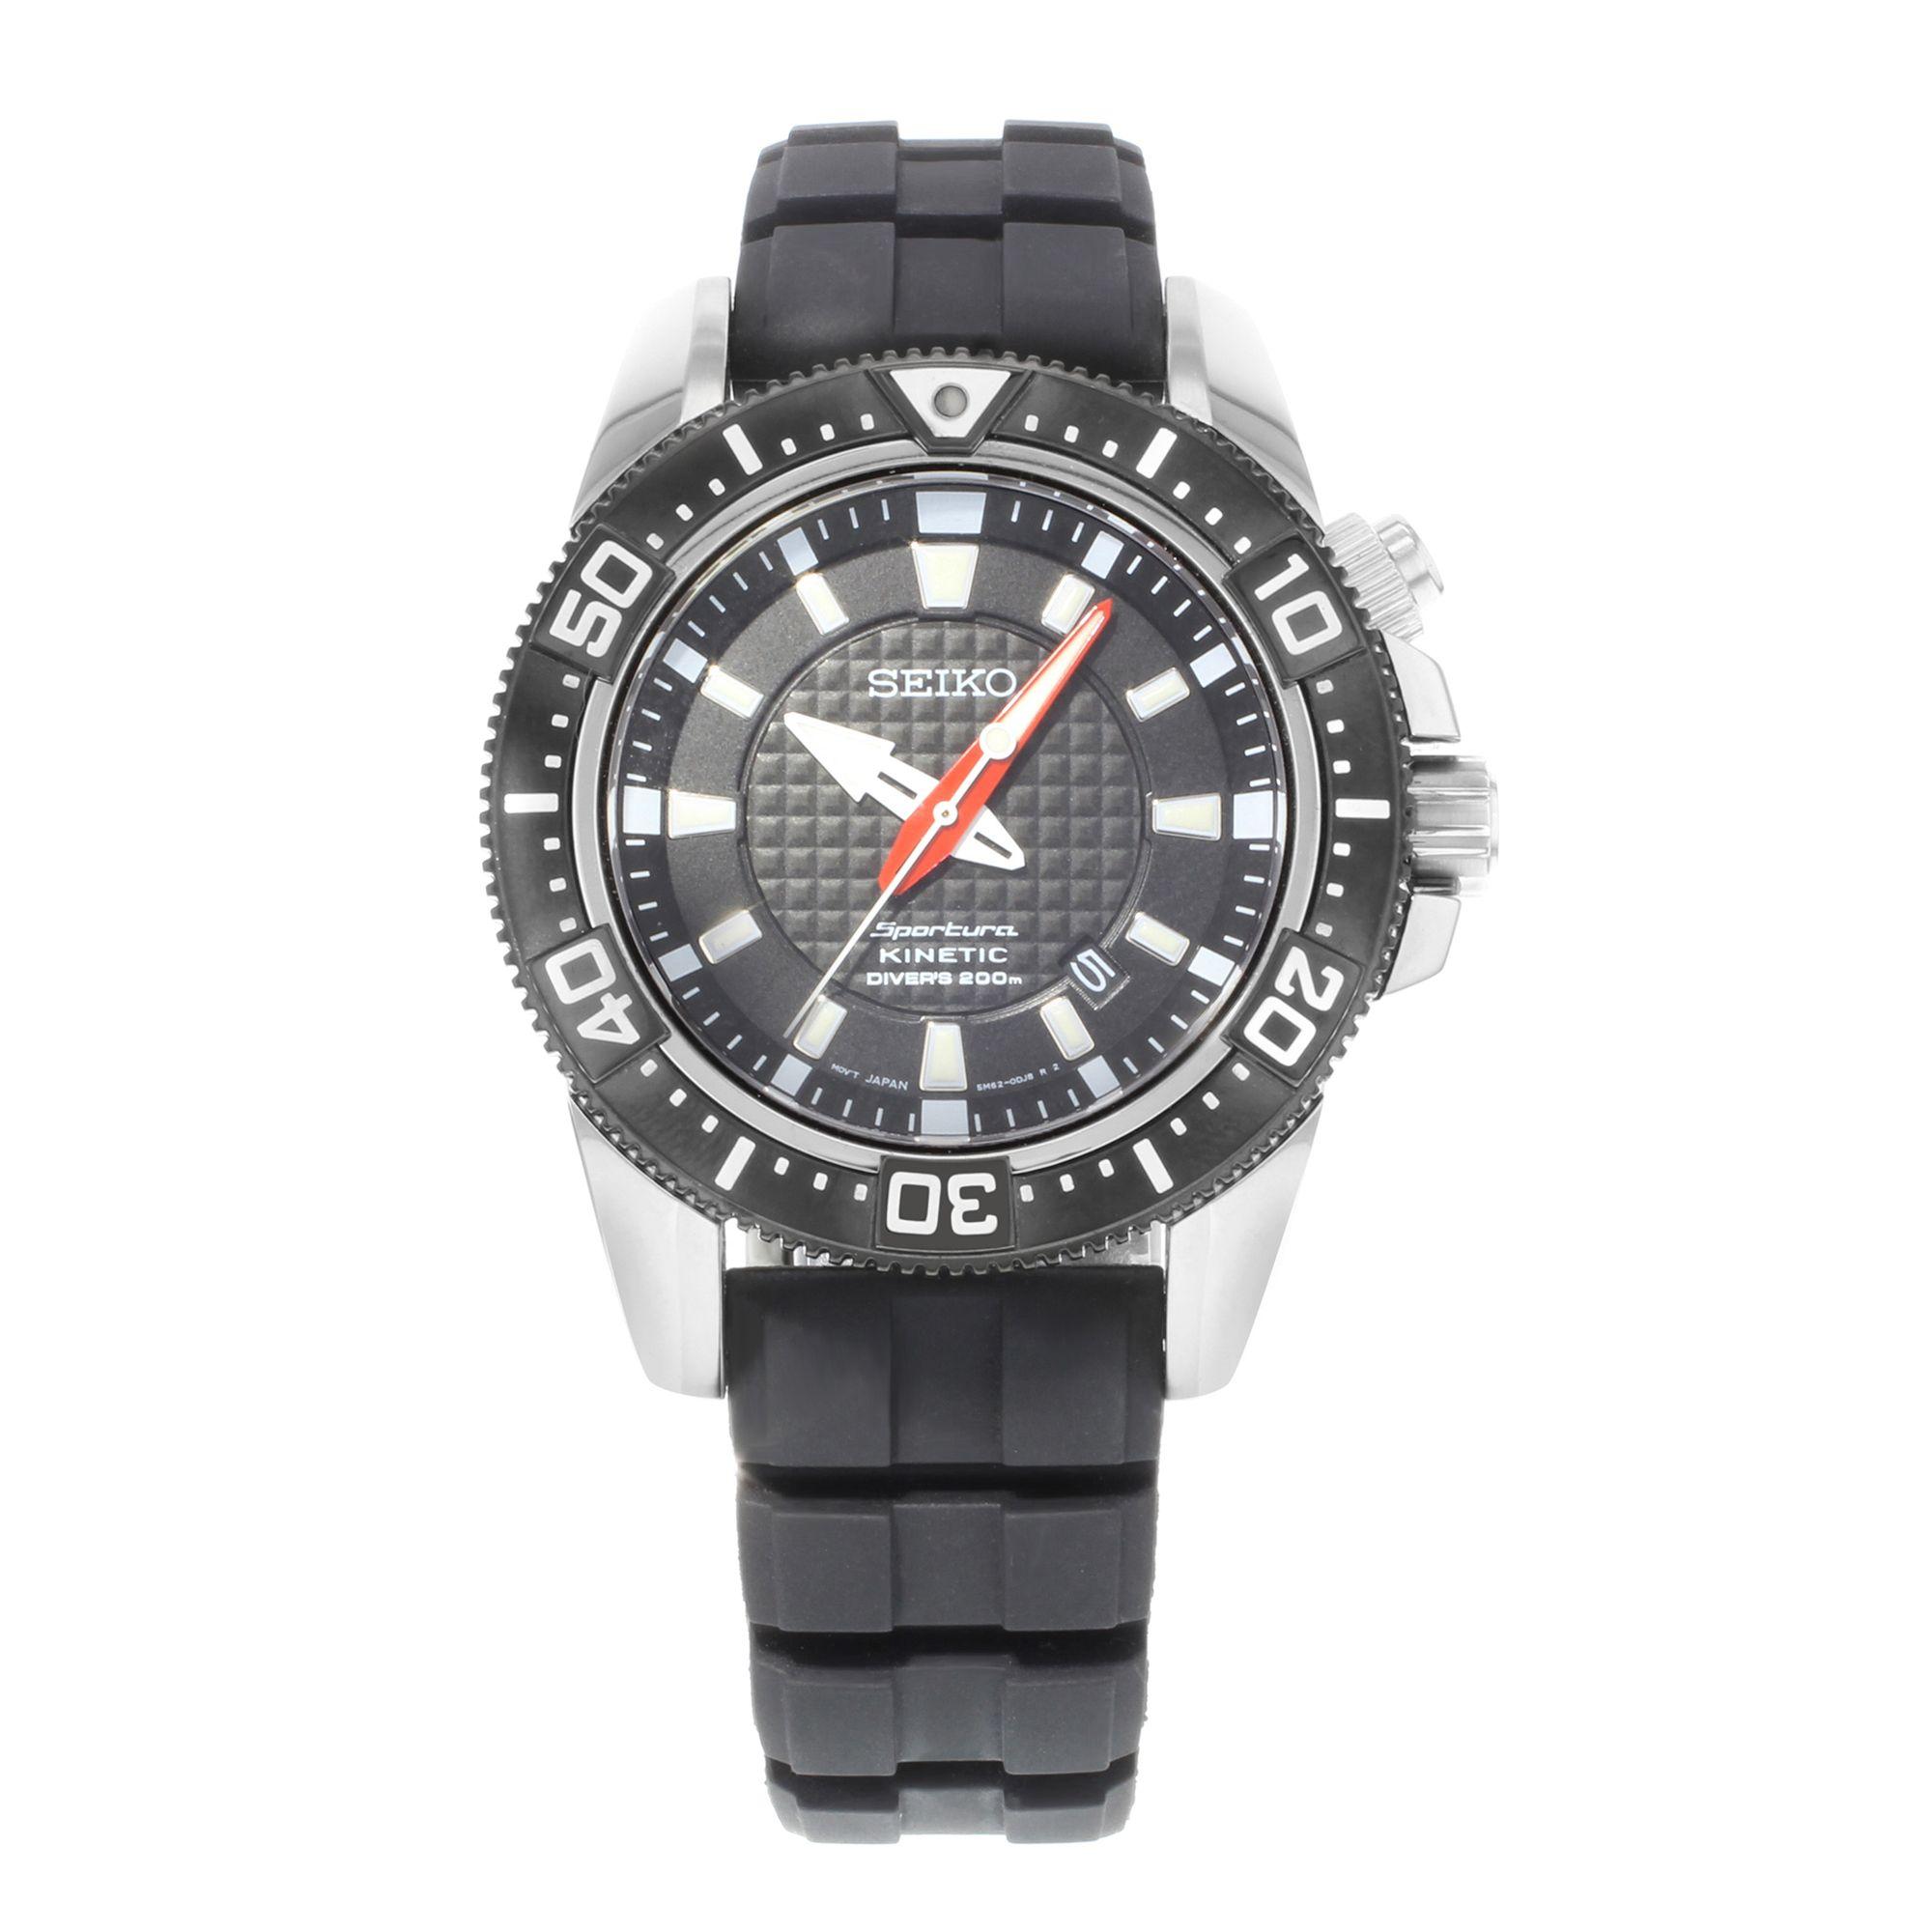 Seiko Sportura SKA513 161021 Stainless Steel Kinetic Quartz Men's Watch